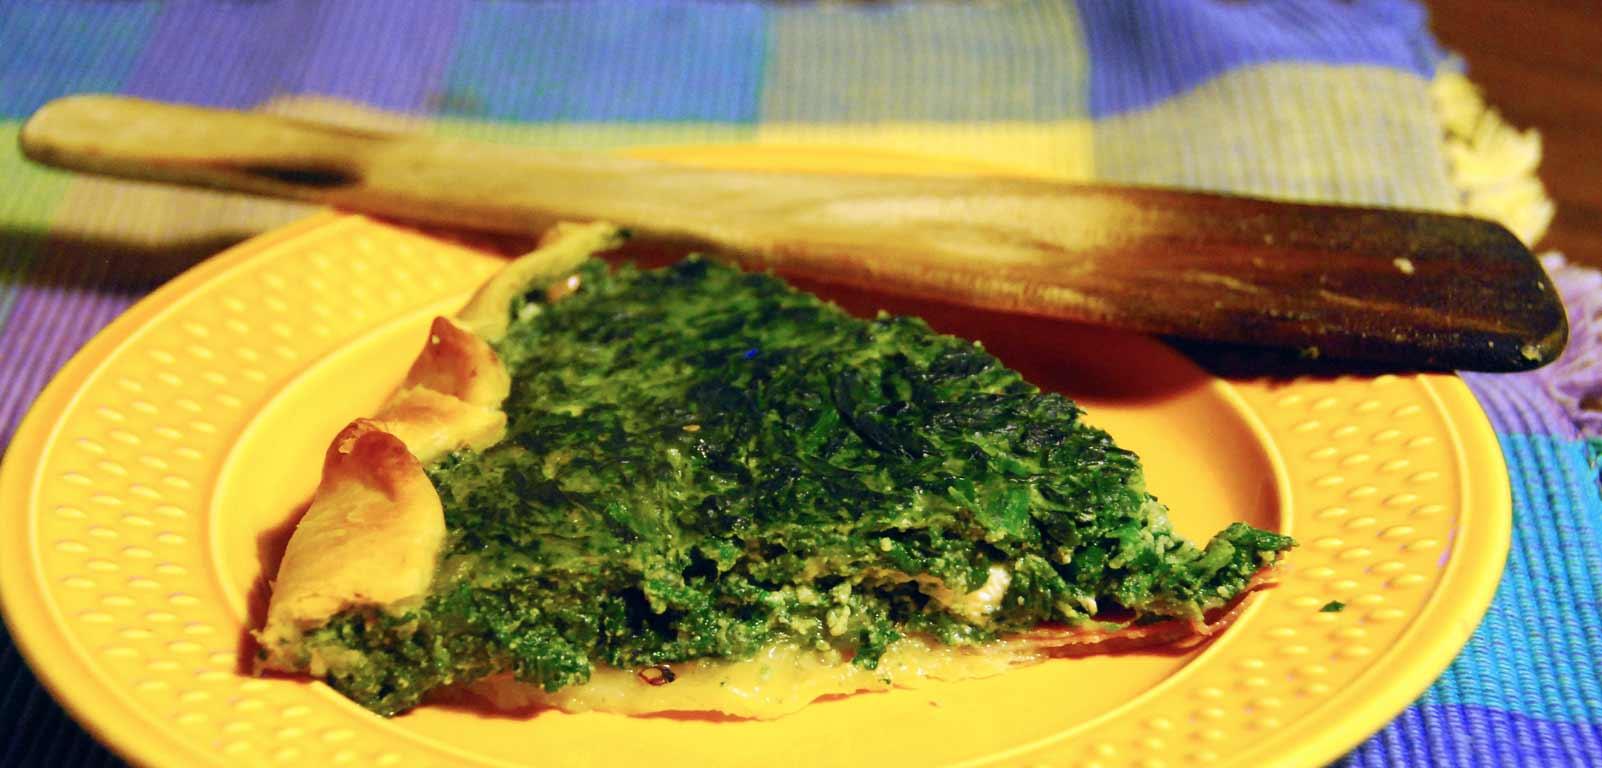 October 10 Class: Spinach Gorgonzola Quiche